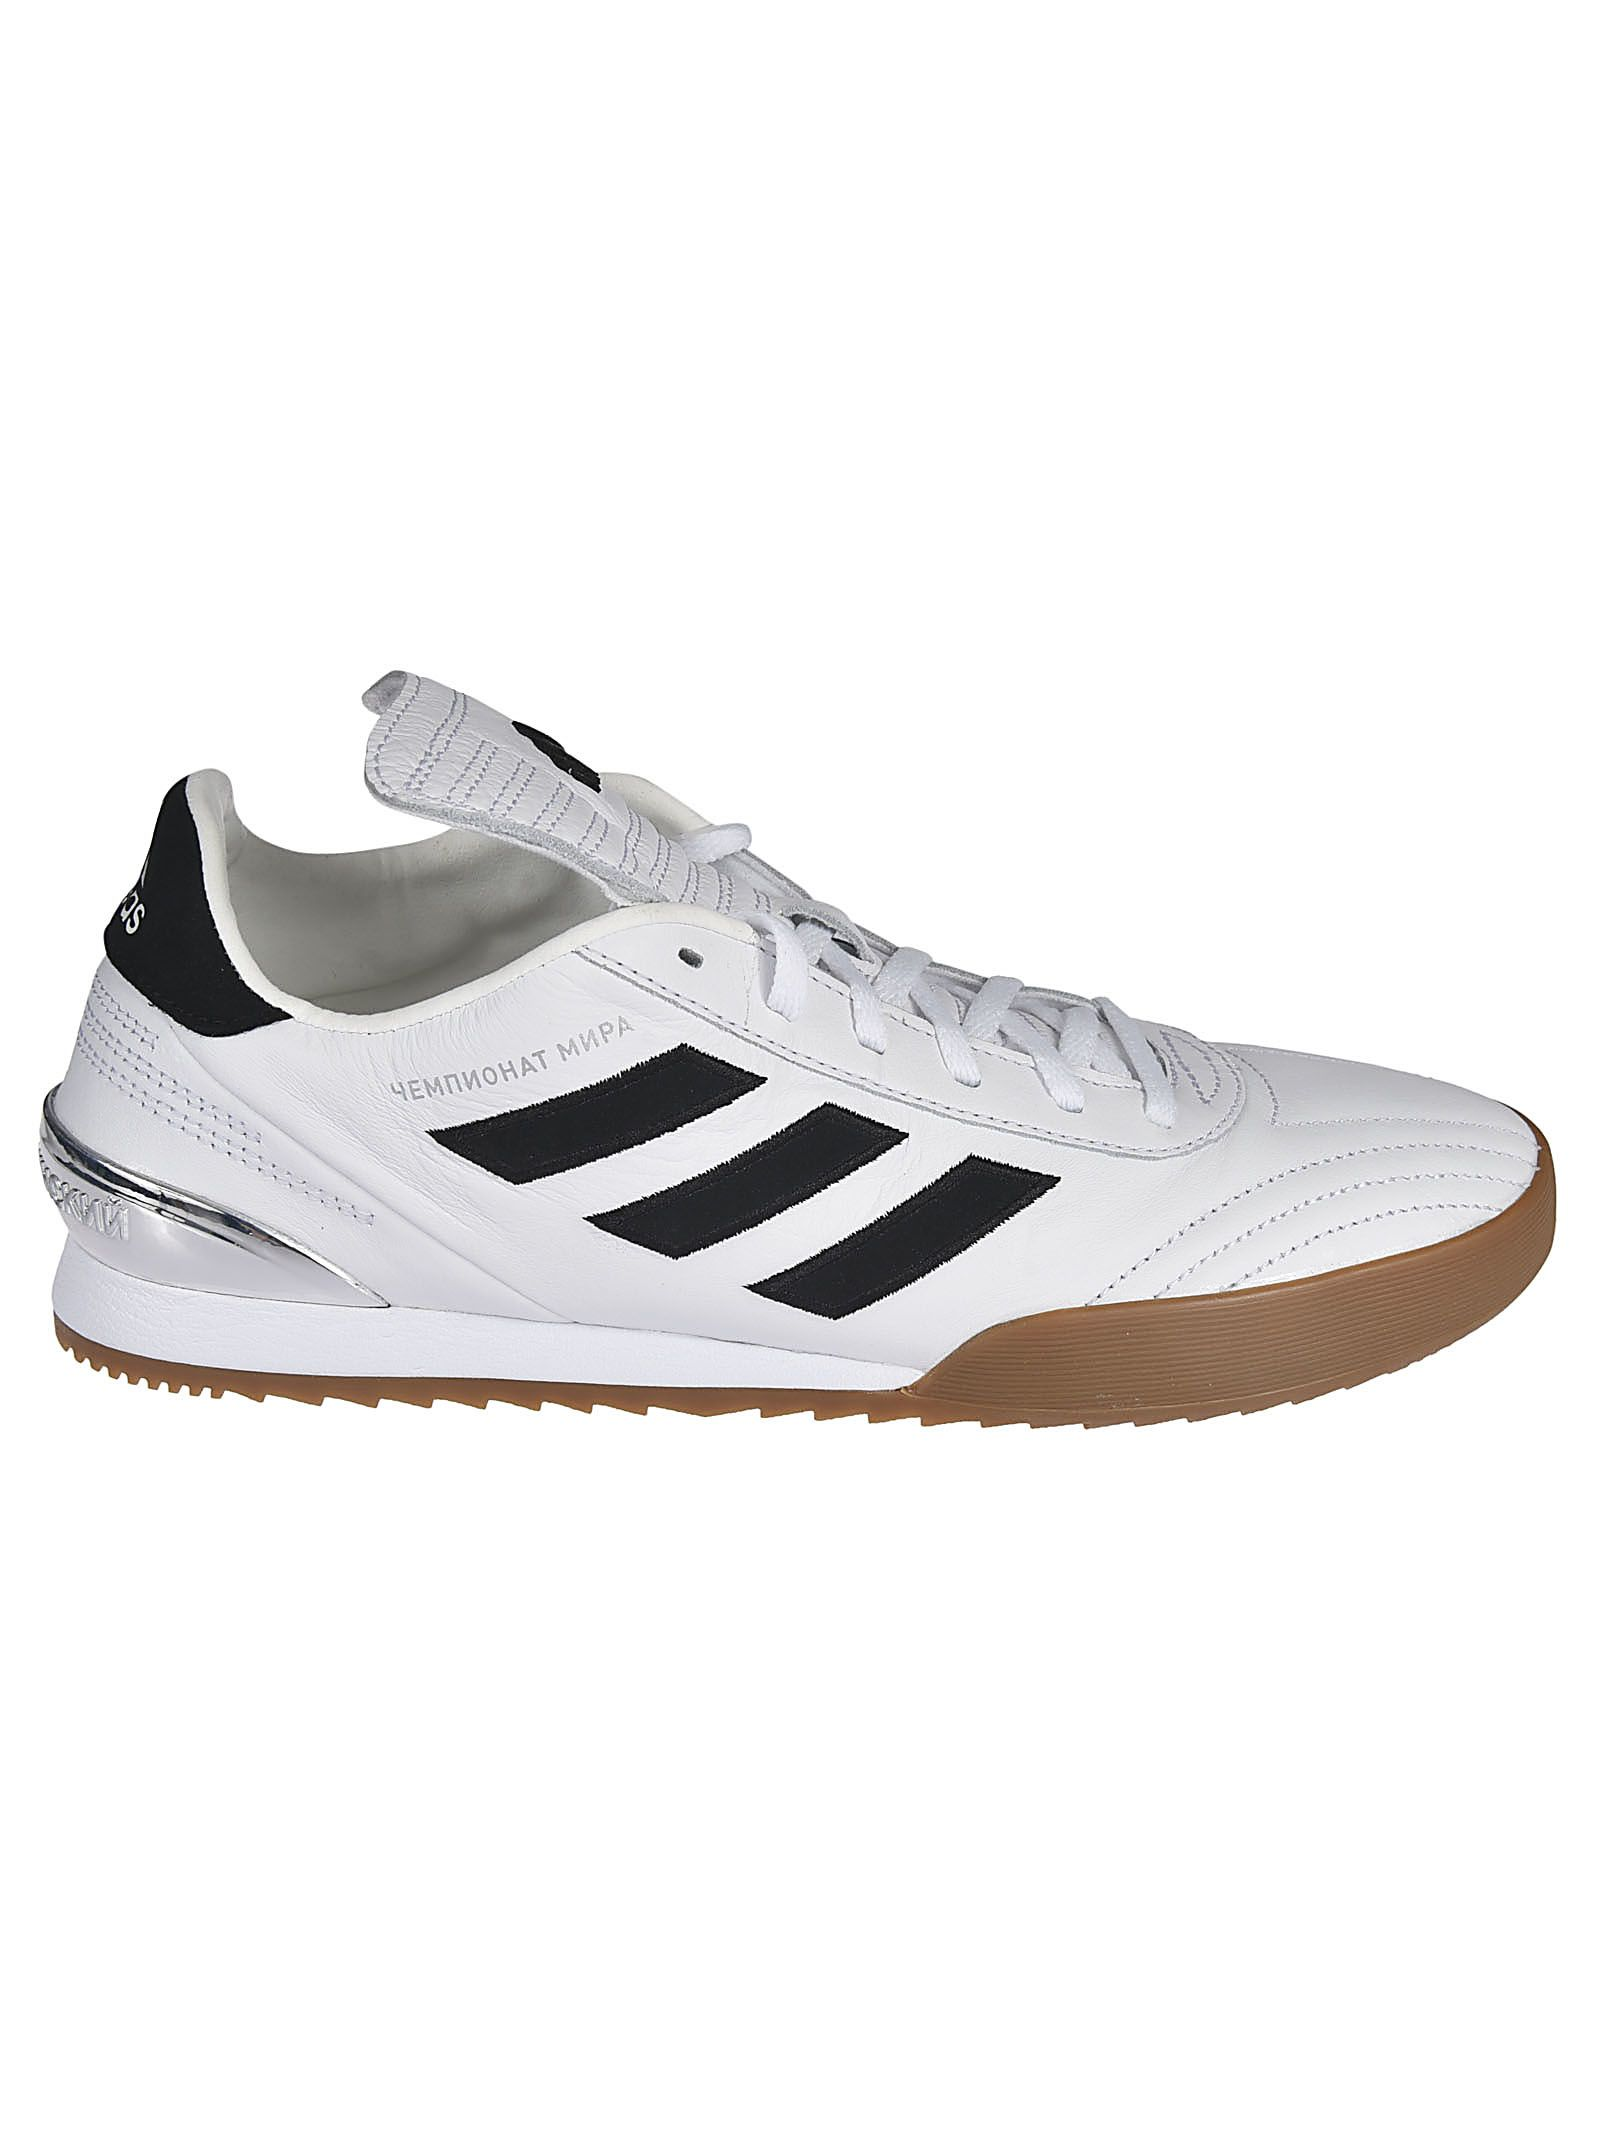 cb2667f9e6de09 Gosha Rubchinskiy Gosha Rubchinskiy Copa Wc Sneakers - Bianco ...